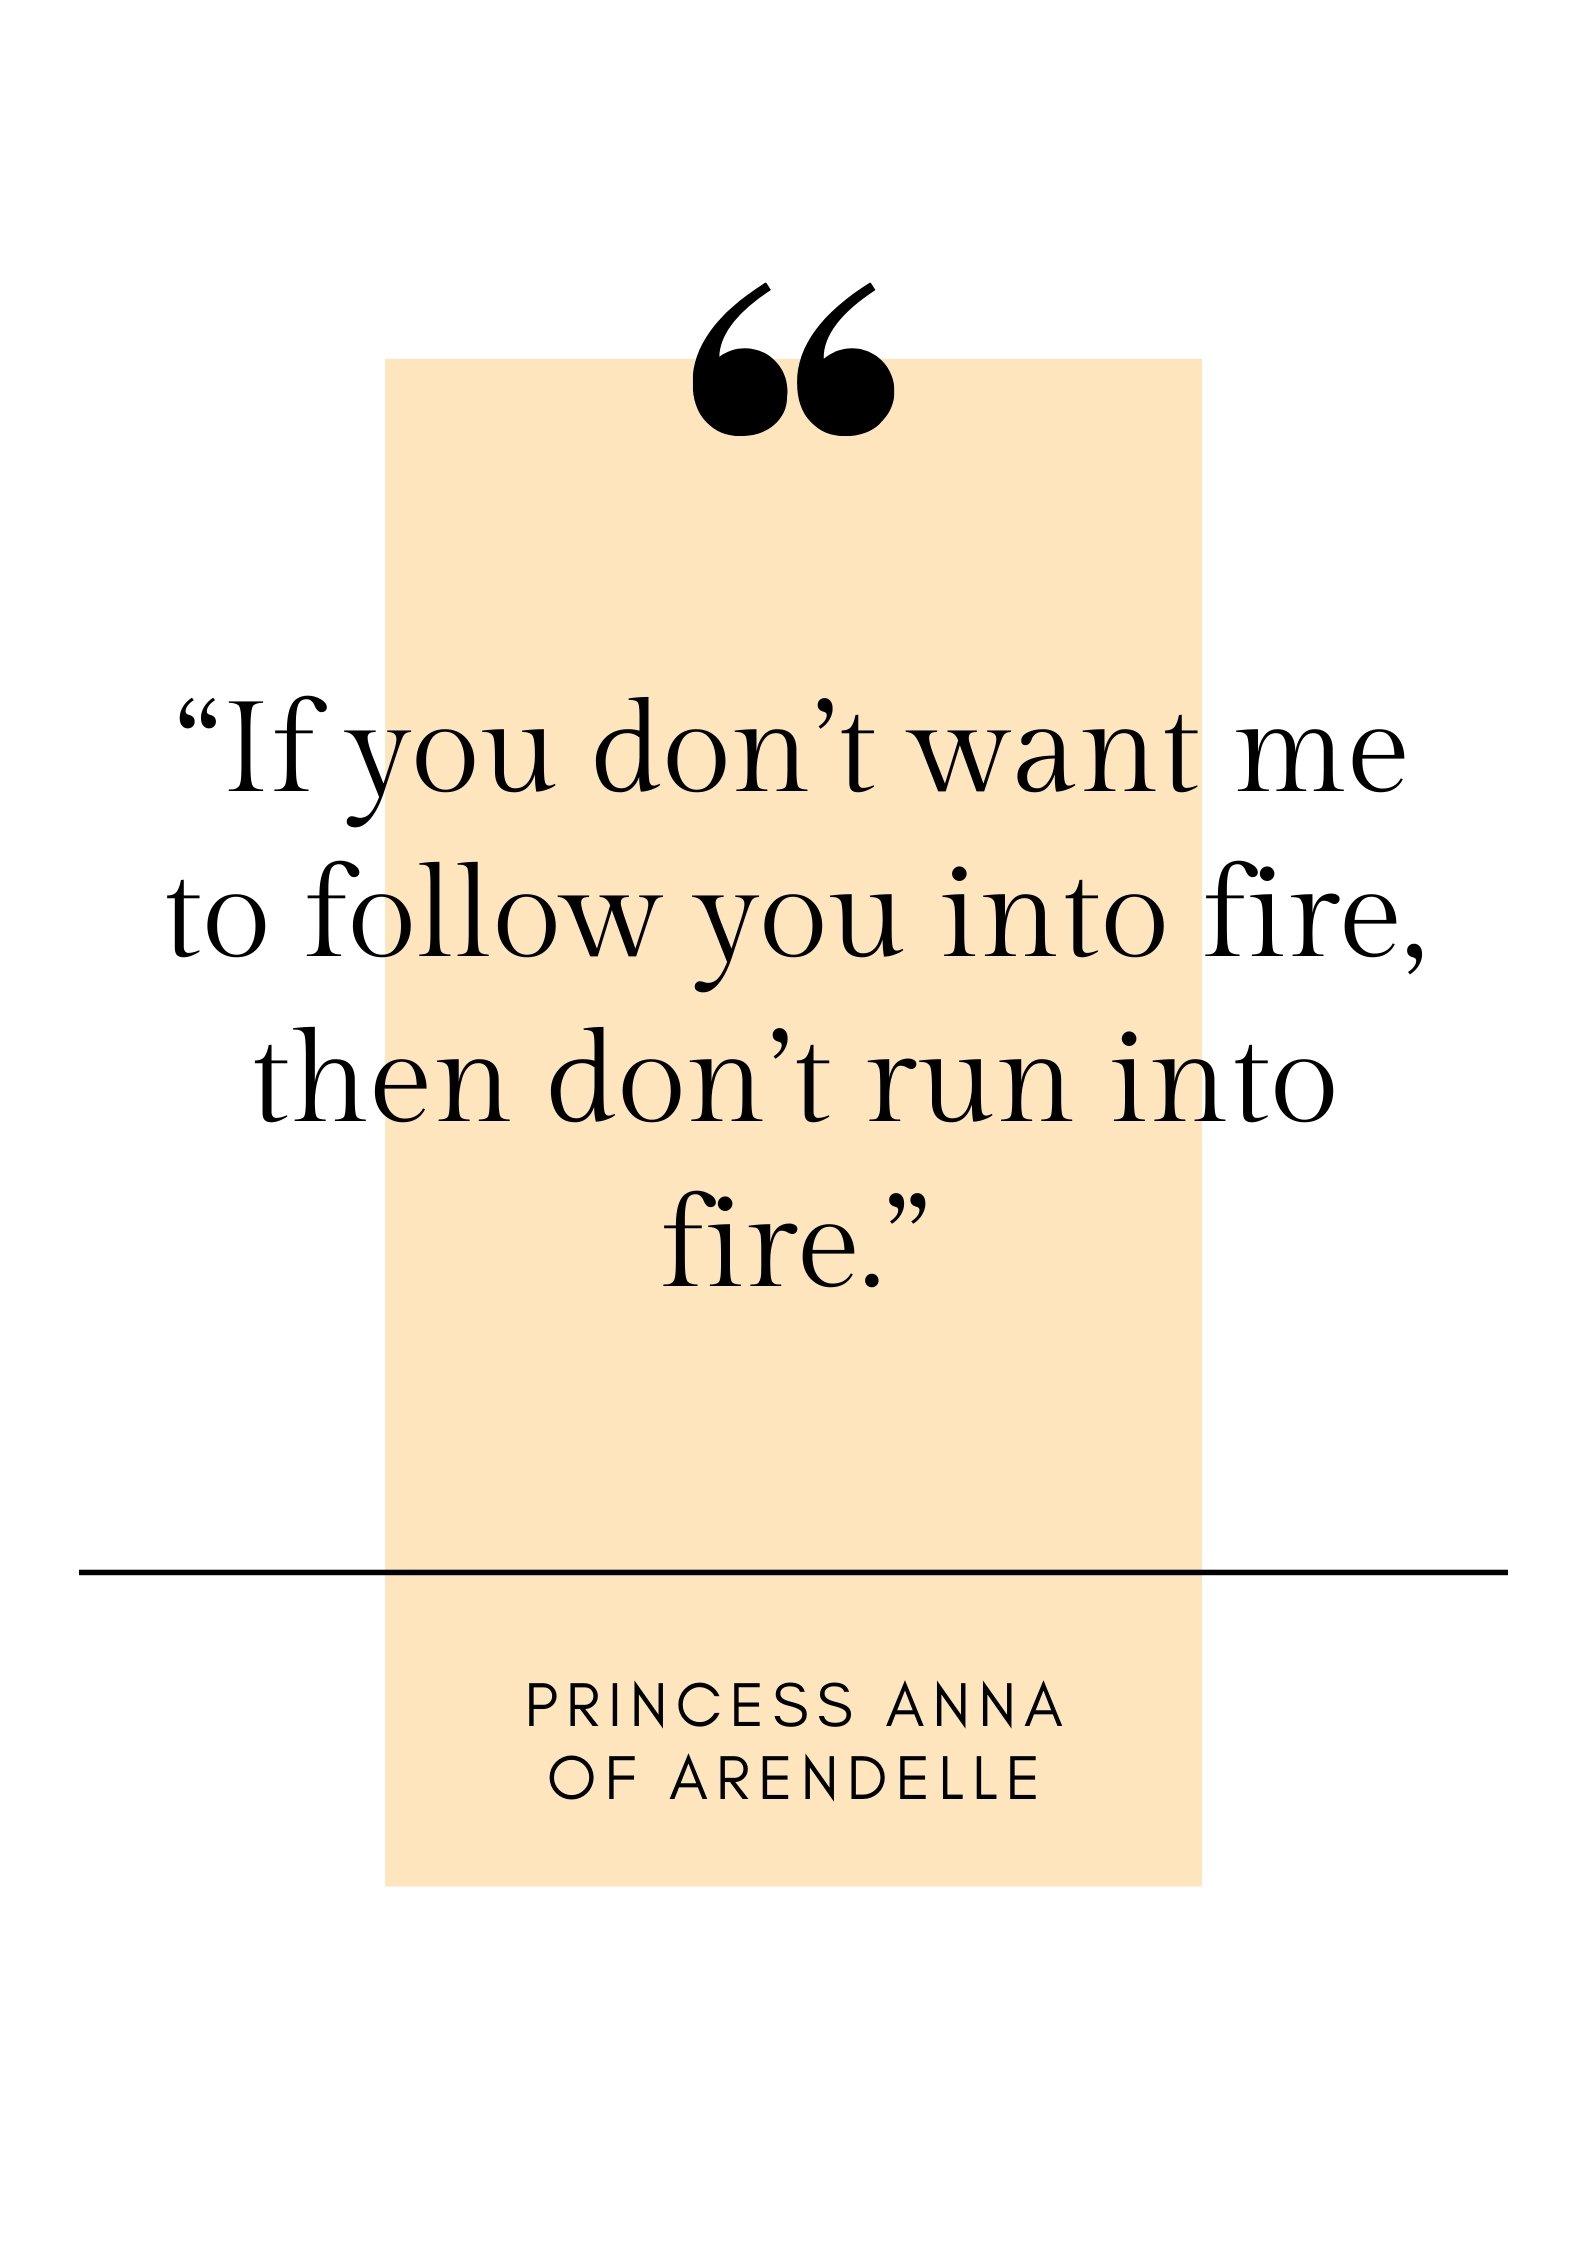 princess anna quote